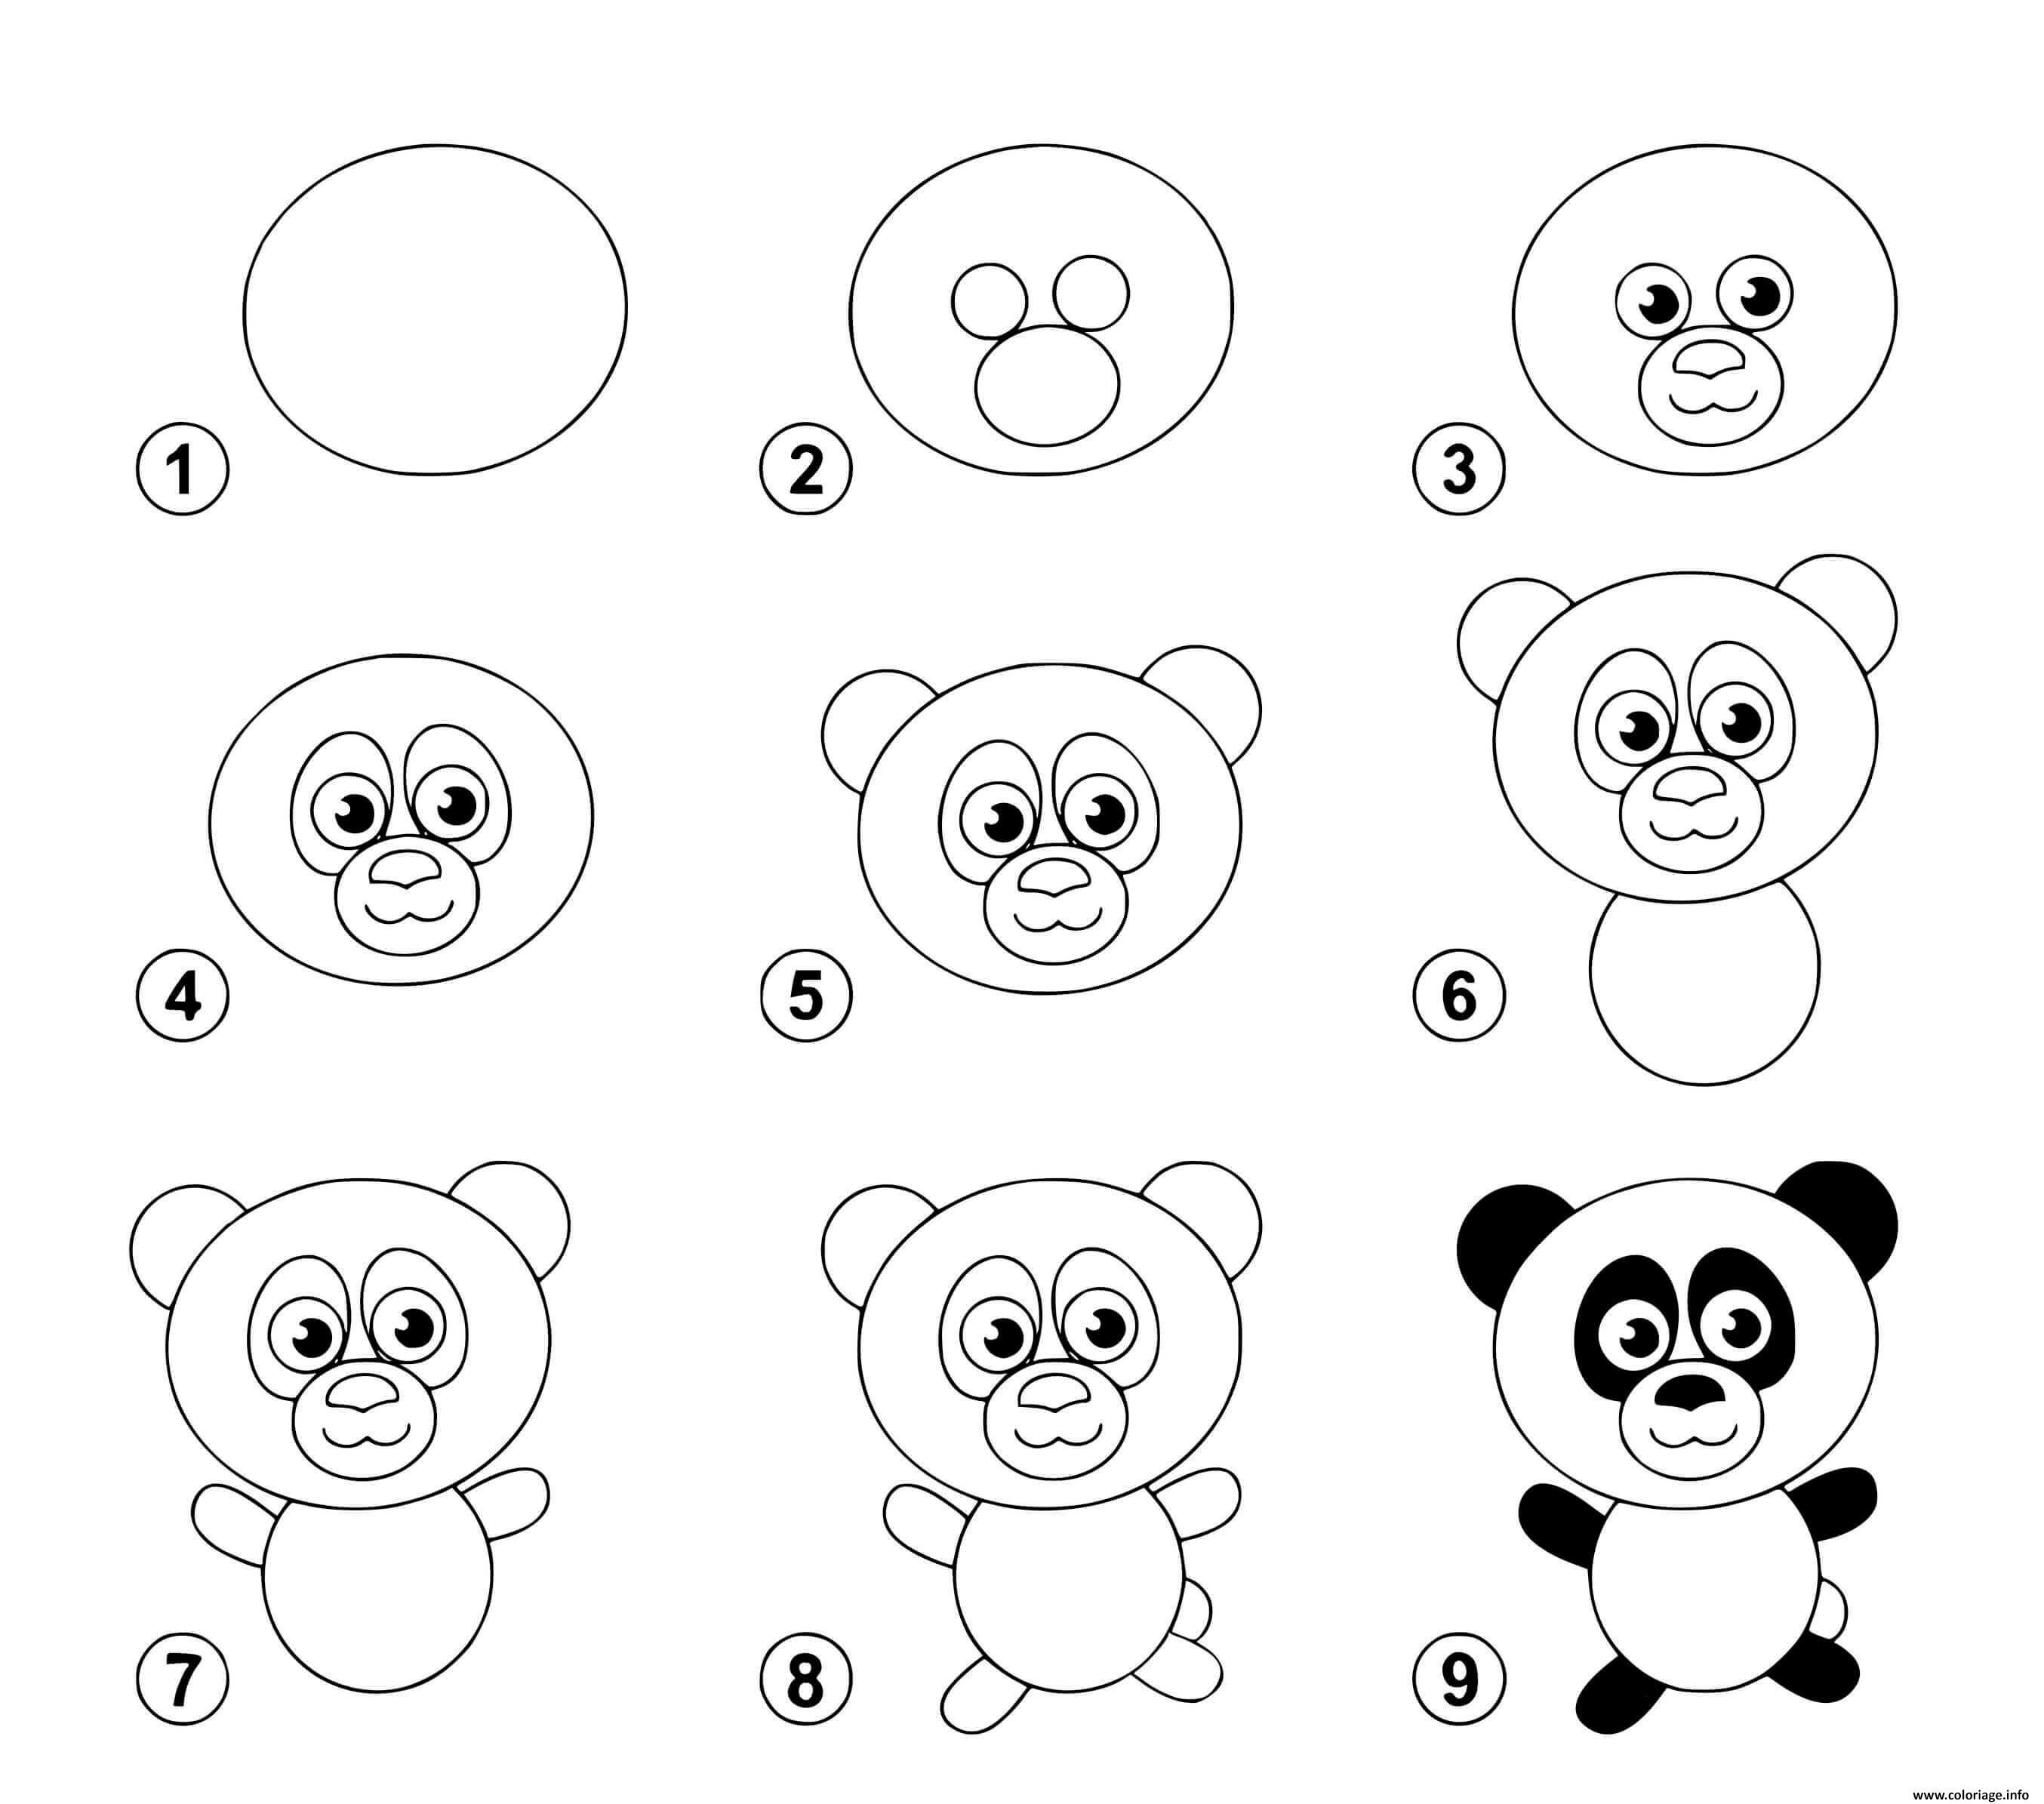 Incroyable Dessin Facile Et Sympa D Un Panda Super Mignon Youtube